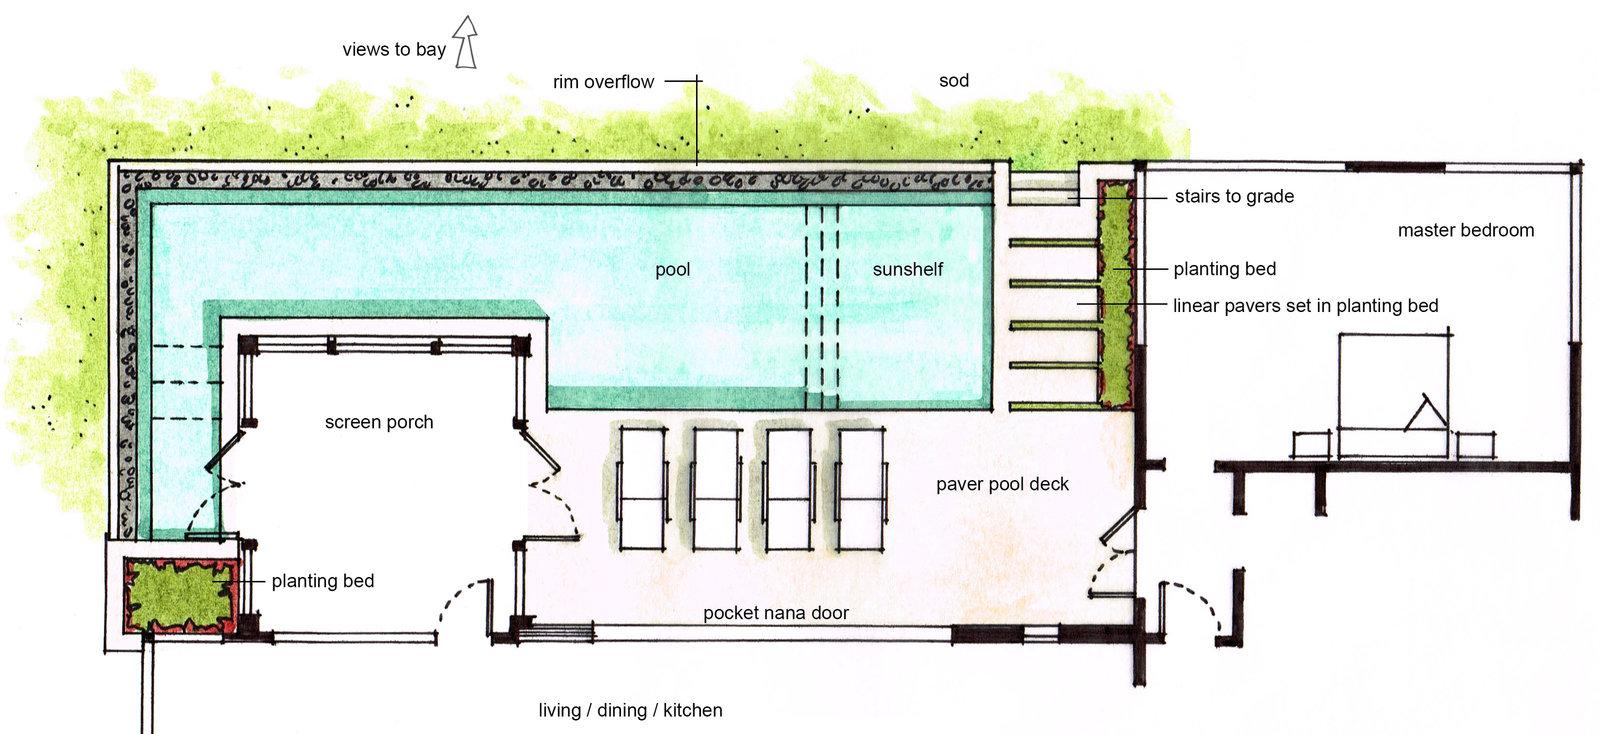 Granola Pool Schematic Cervenka Residence